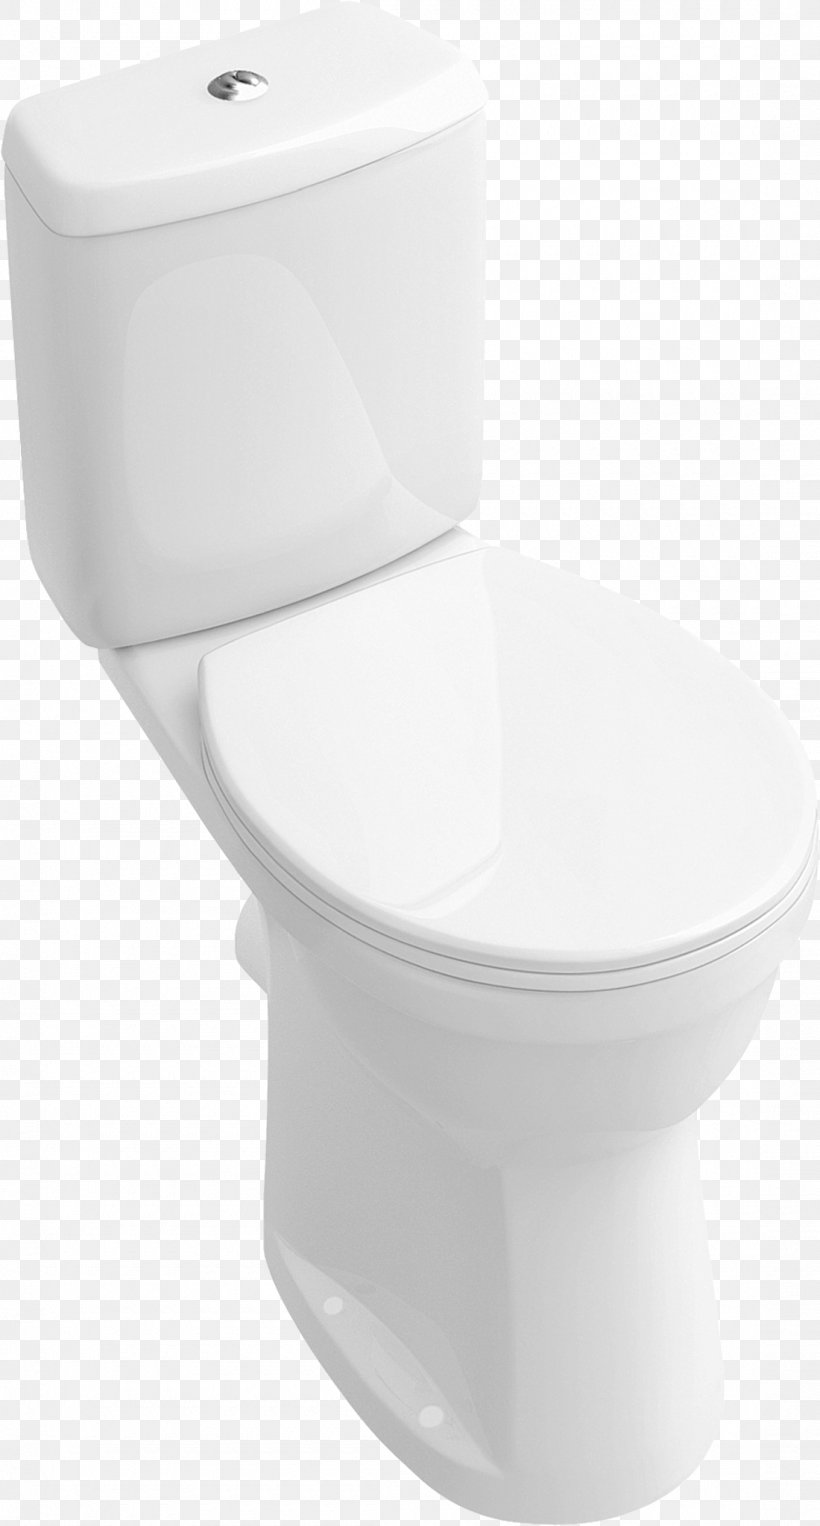 Toilet Seat Tap Bidet Ceramic Bathroom, PNG, 1100x2048px, Bideh, Bathroom, Bathroom Sink, Bidet, Ceramic Download Free